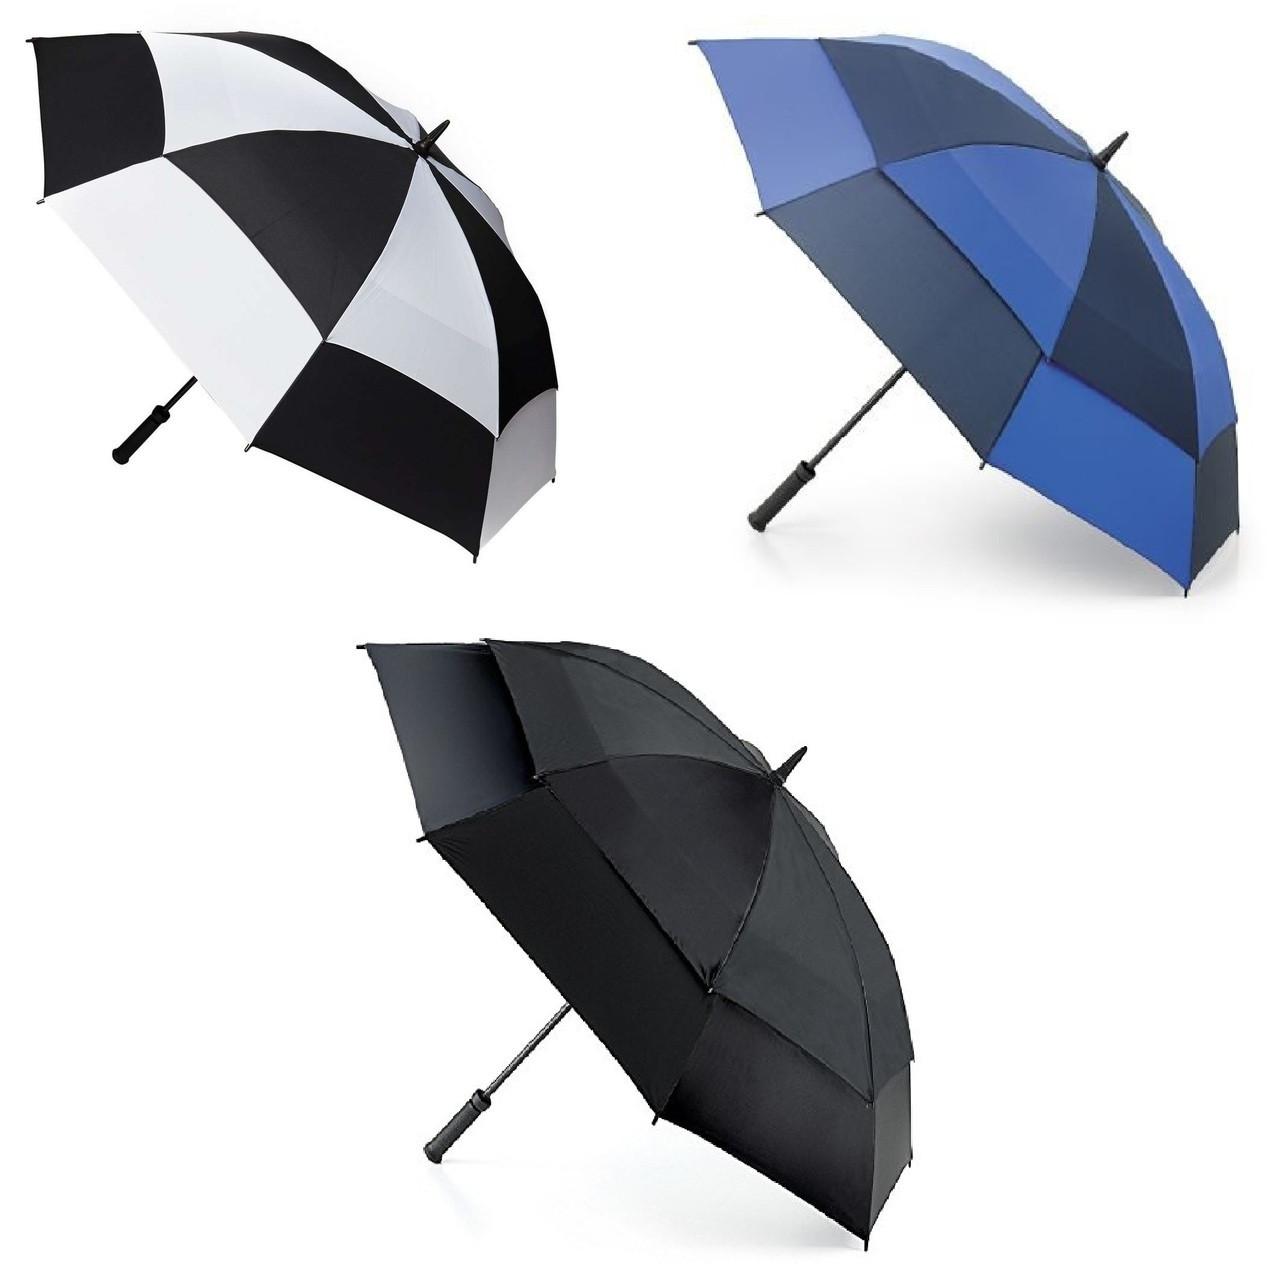 0aa898867 Fulton Stormshield Mens Walking Length Double Canopy Umbrella -  umbrellasuperstore.co.uk